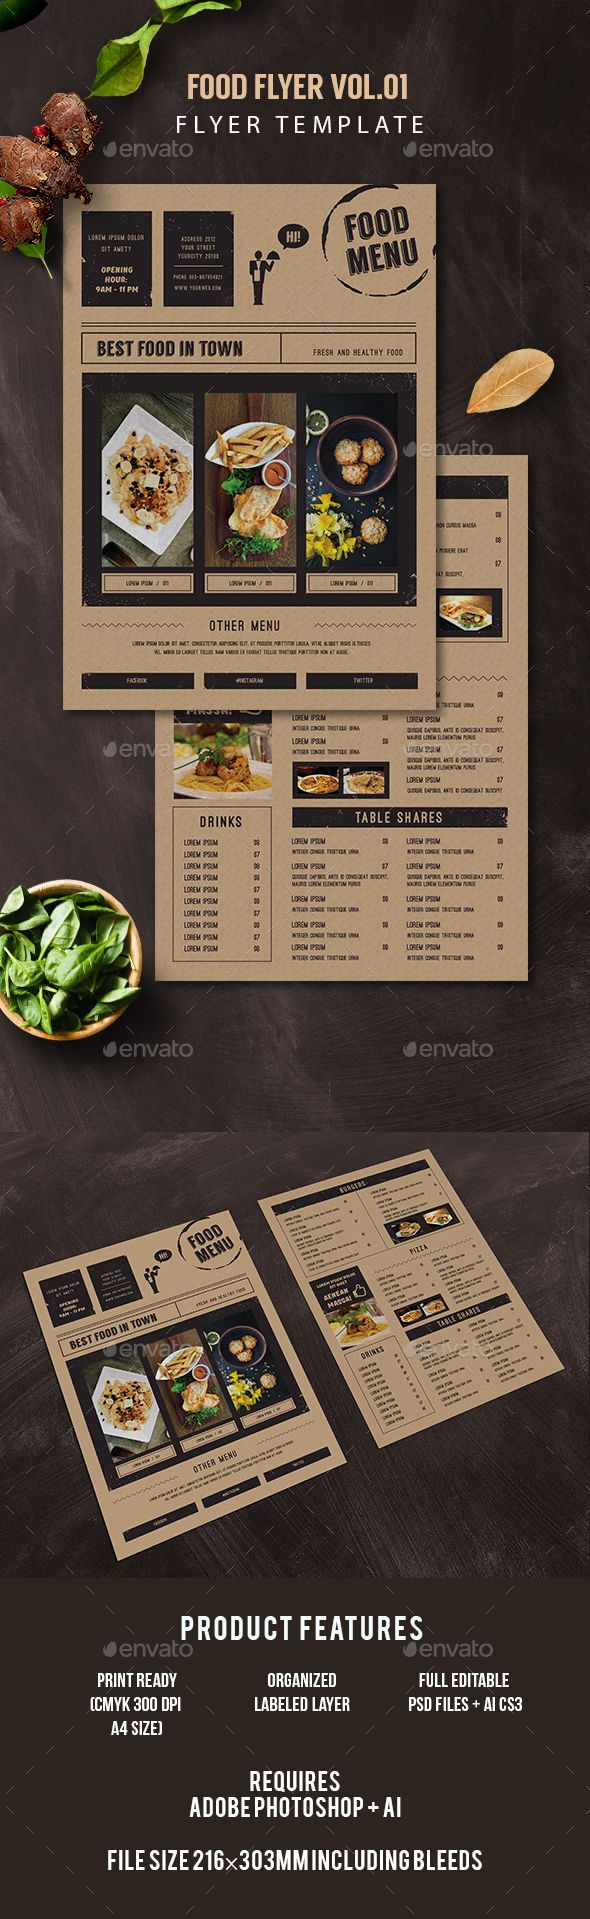 Food Flyer - Restaurant #Flyers Download here: https://graphicriver.net/item/food-flyer/17322511?ref=alena994